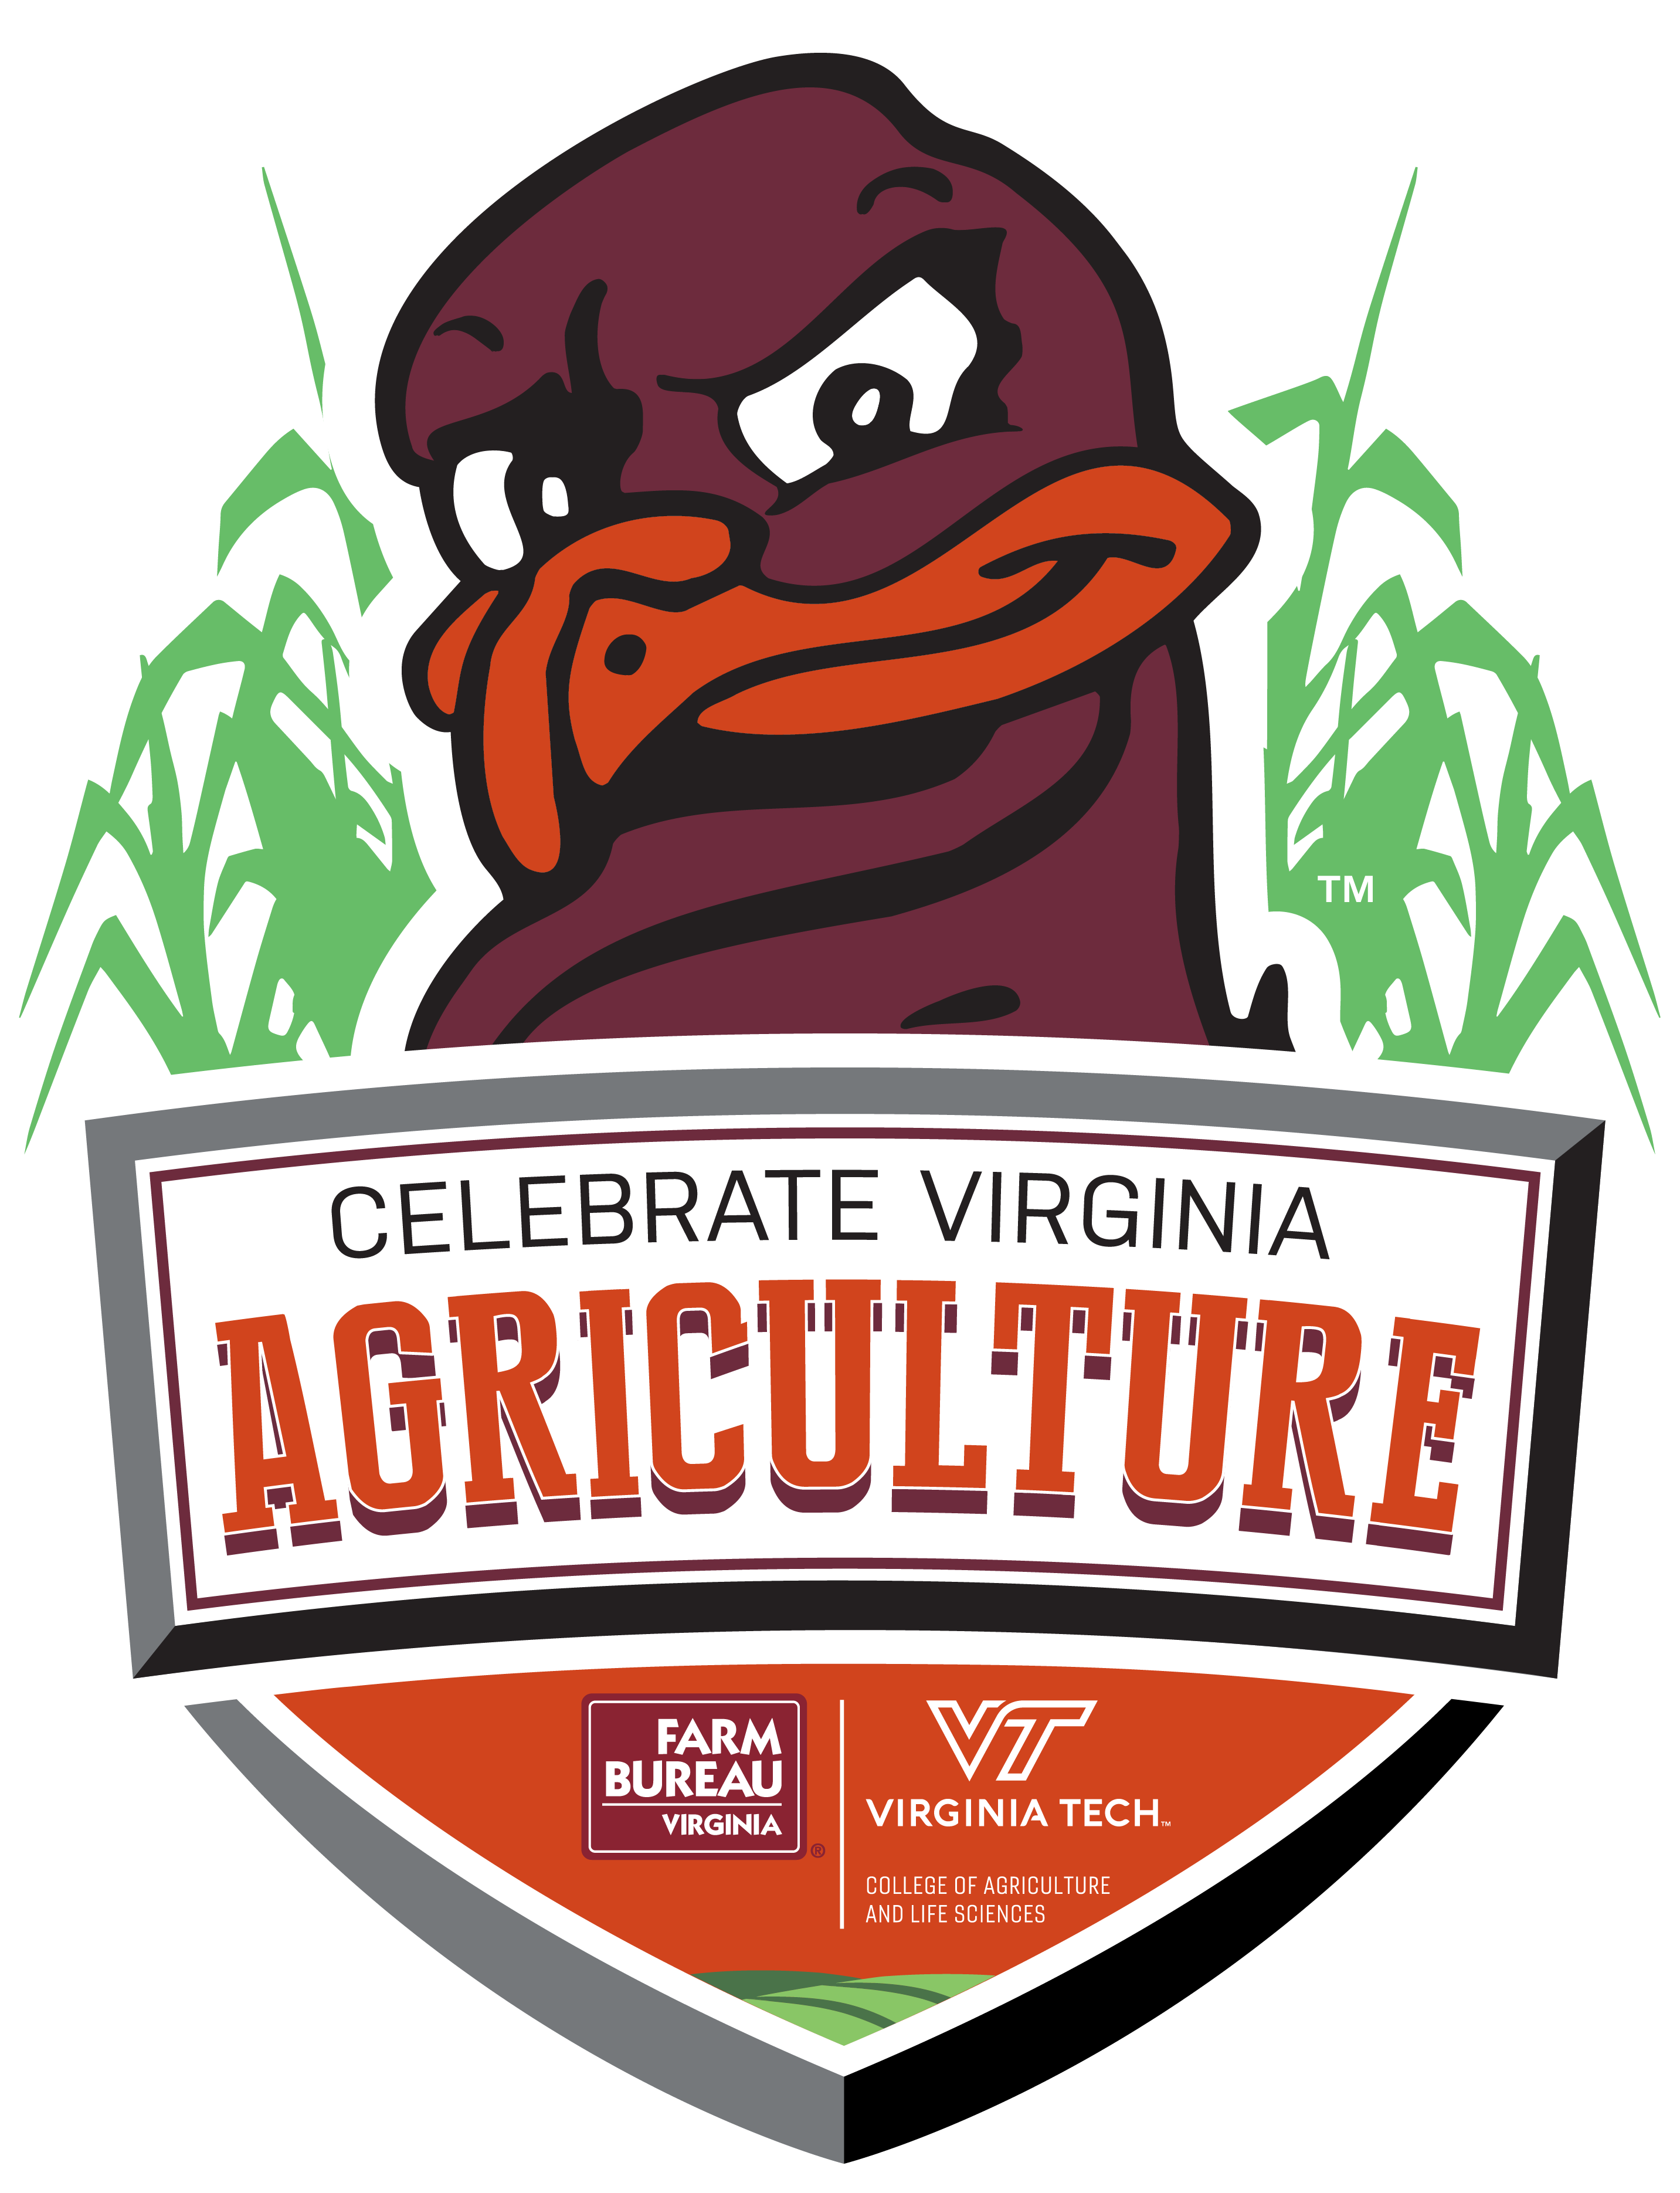 Farming clipart agriculture logo. Virginia tech day sponsored